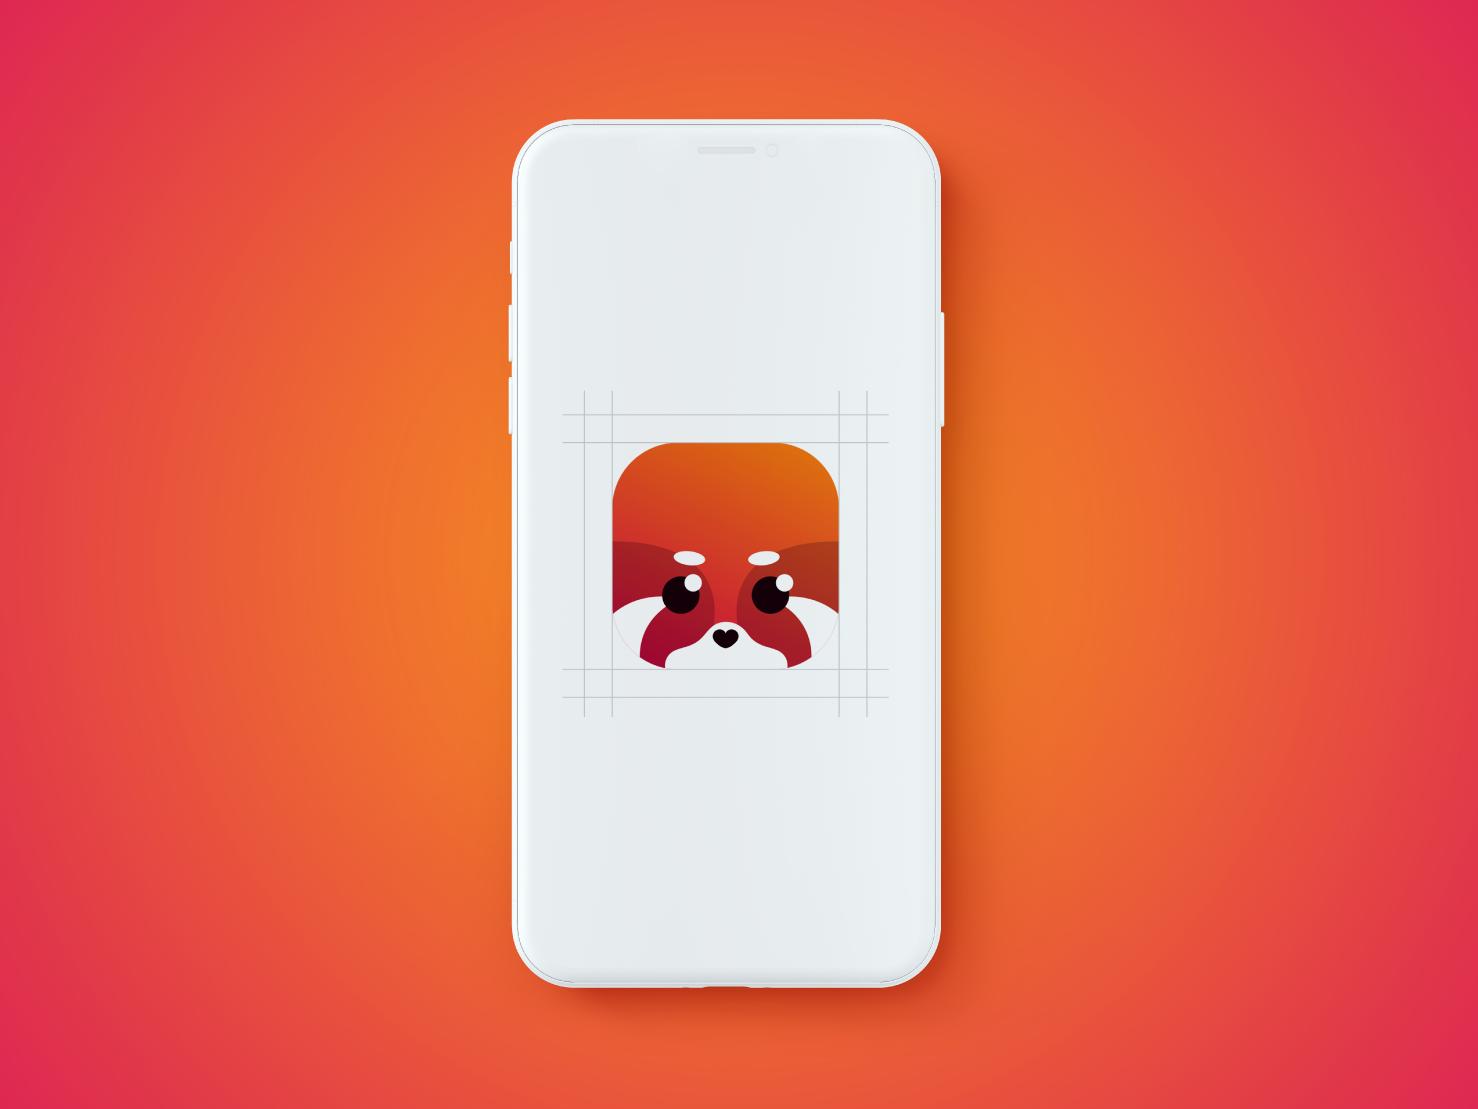 Red panda Icon phone app fox vector logo phone panda logo creative logo 3d red panda icon logo